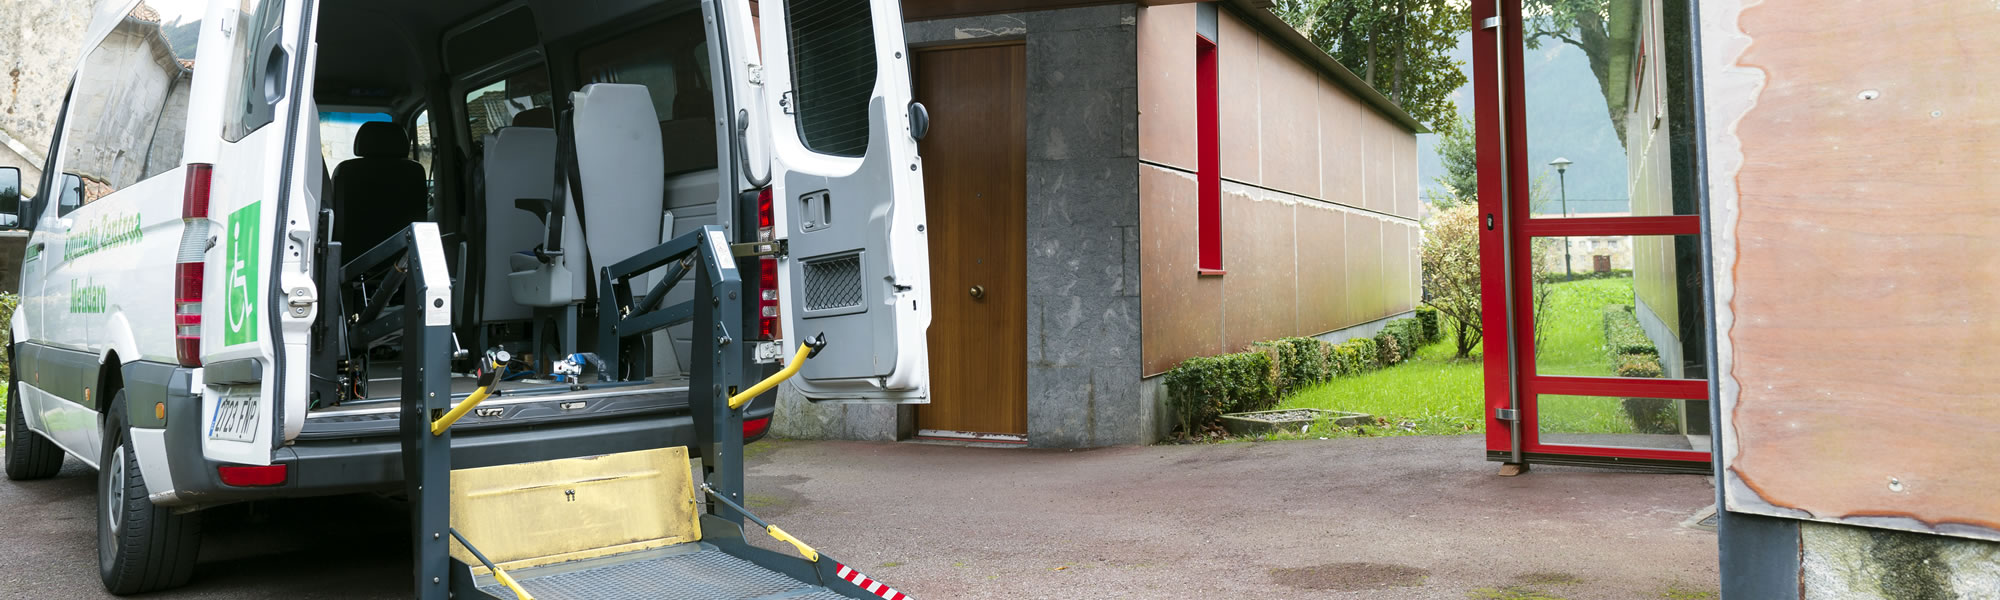 Zurekin centro para mayores - Transporte adaptado